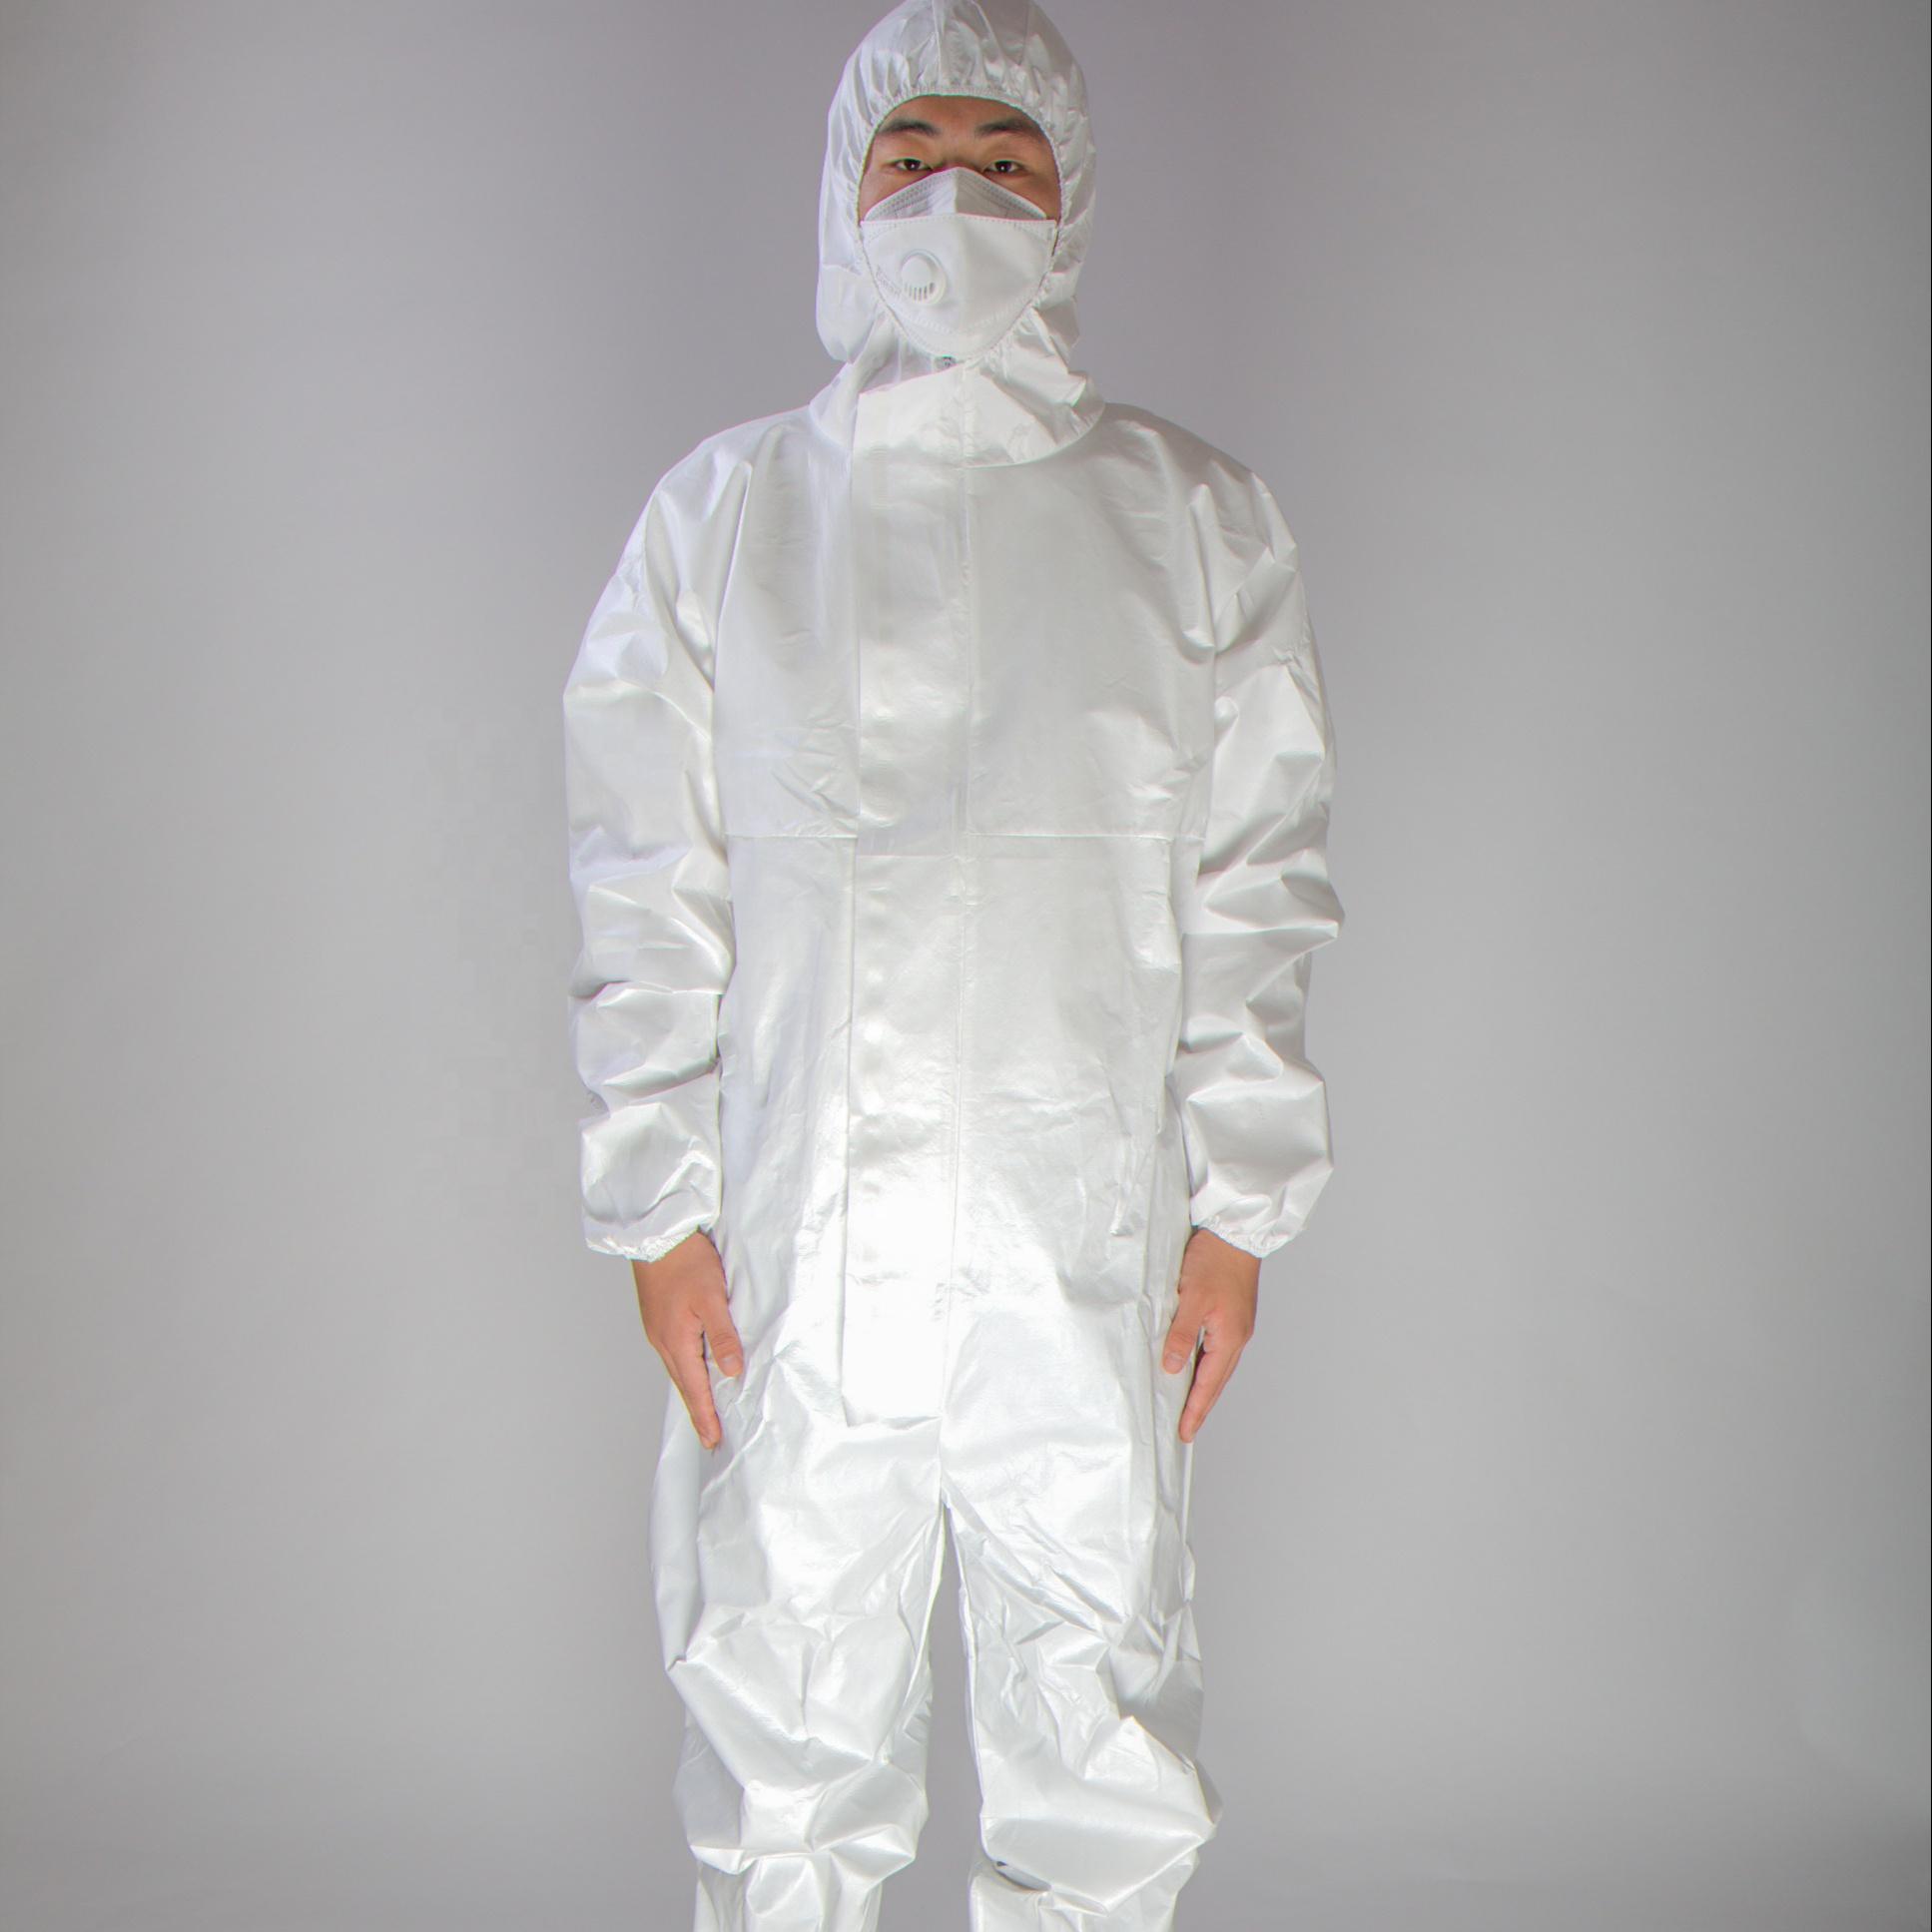 chemical protection hazmat suit coverall high quality suit bio hazard suits - KingCare | KingCare.net